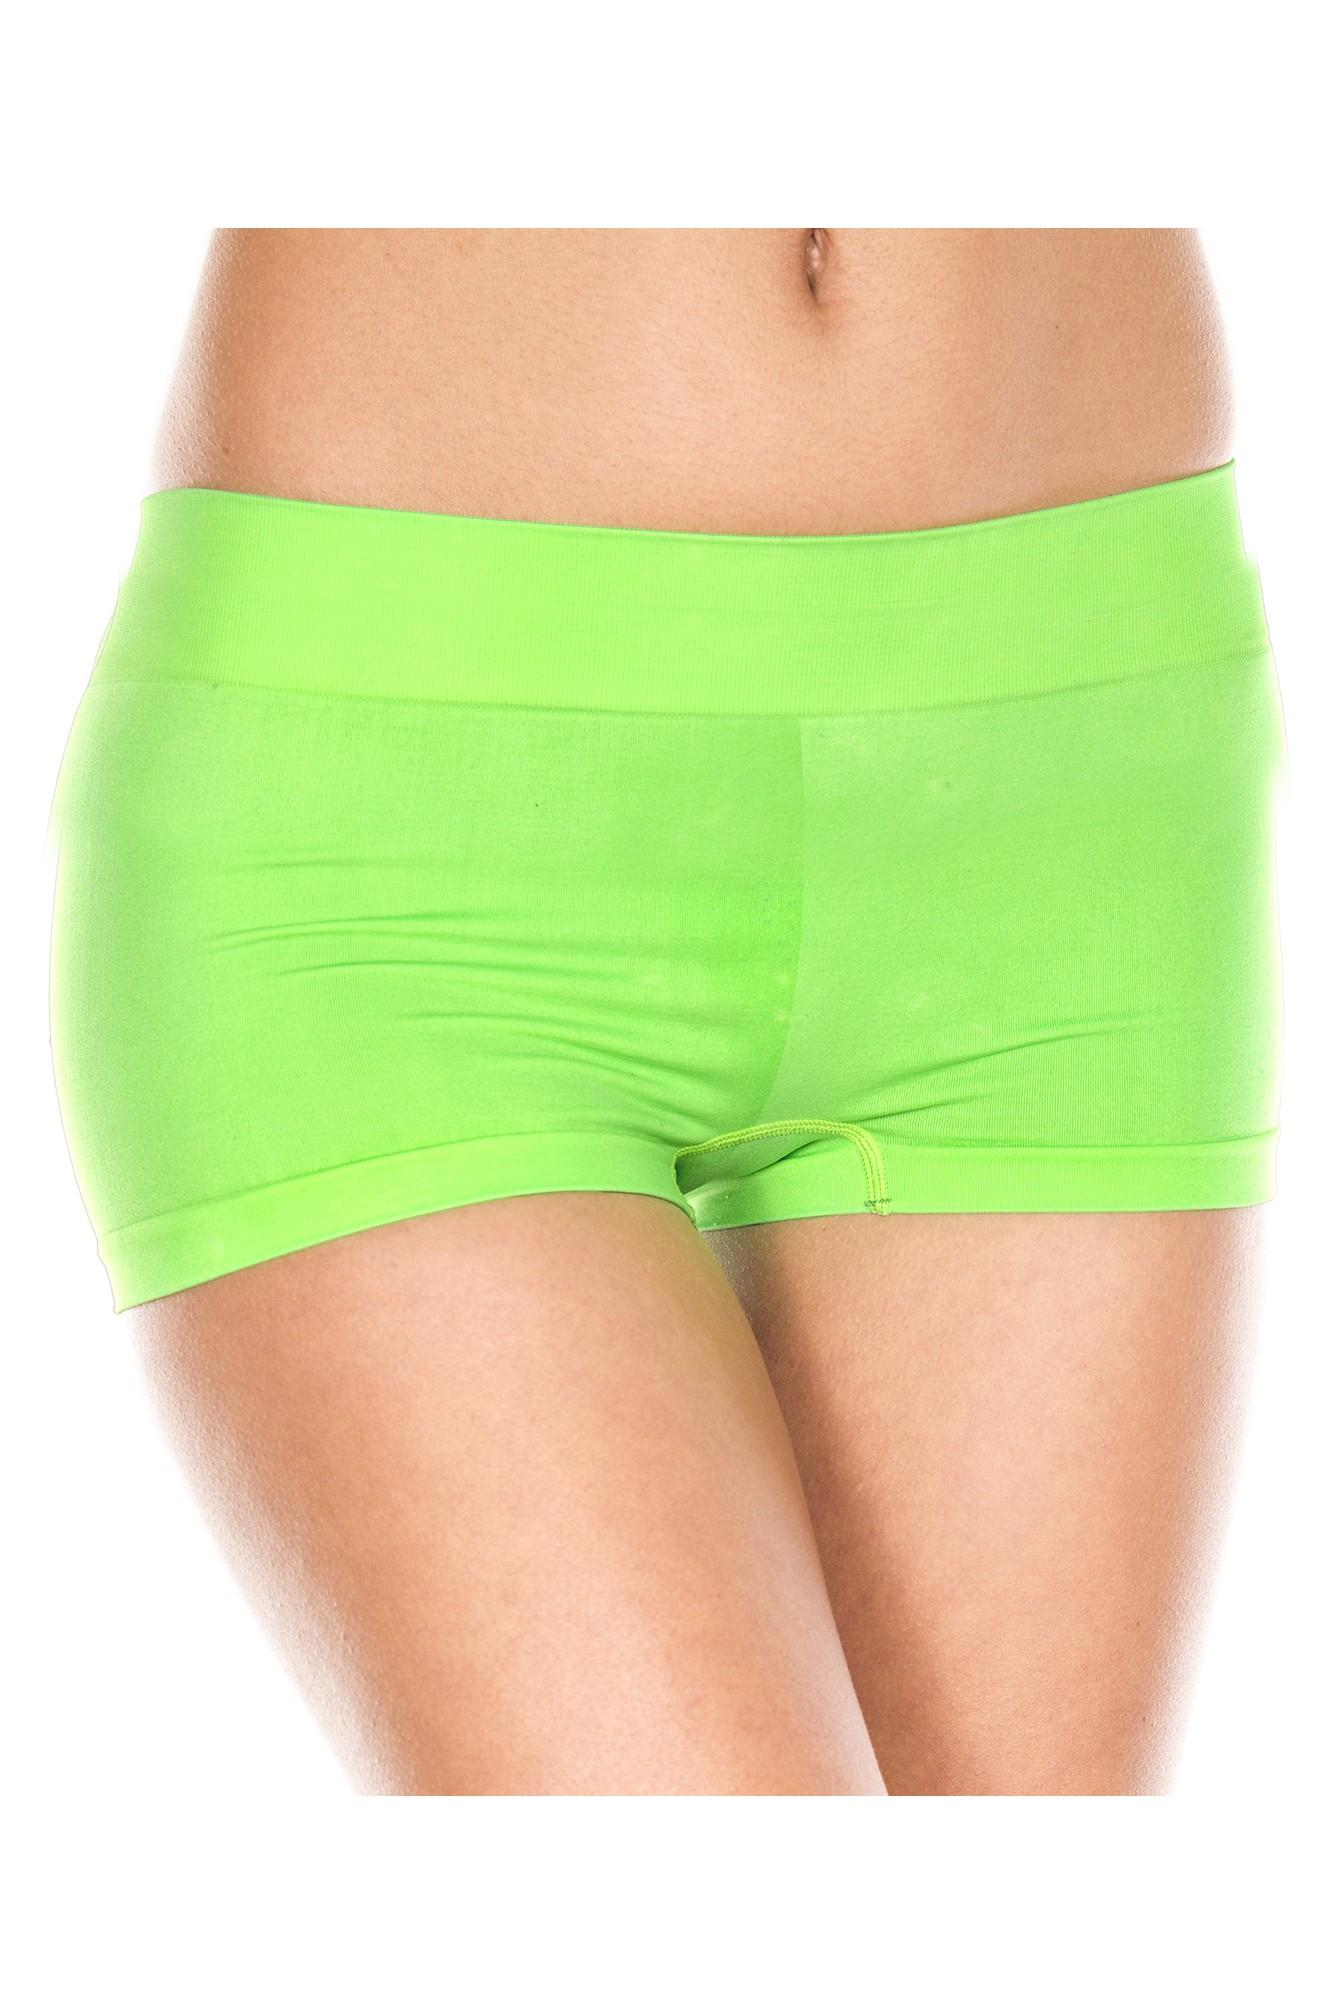 Stretchy matte booty shorts 0121 Edmonton